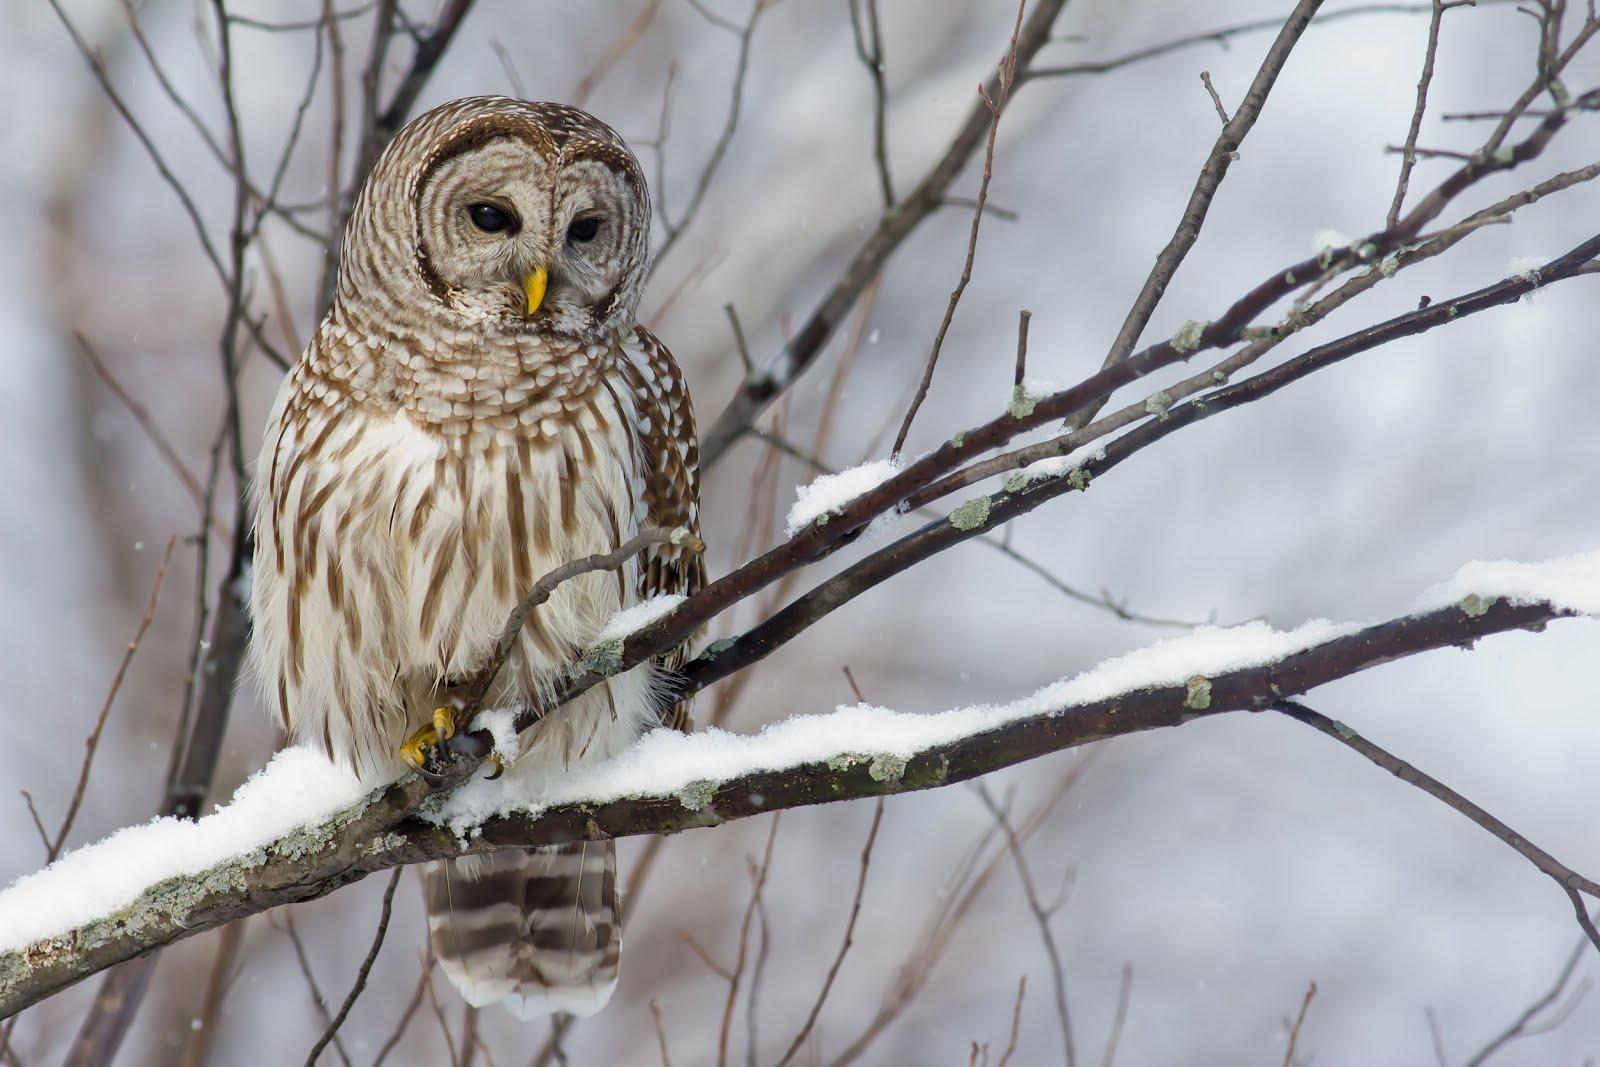 http://1.bp.blogspot.com/-qJa8f1wkchI/T981Co2tp5I/AAAAAAAA8Wo/YVQ3ePJCR2k/s1600/buho-en-la-nieve-owl-snow-aves-.jpg